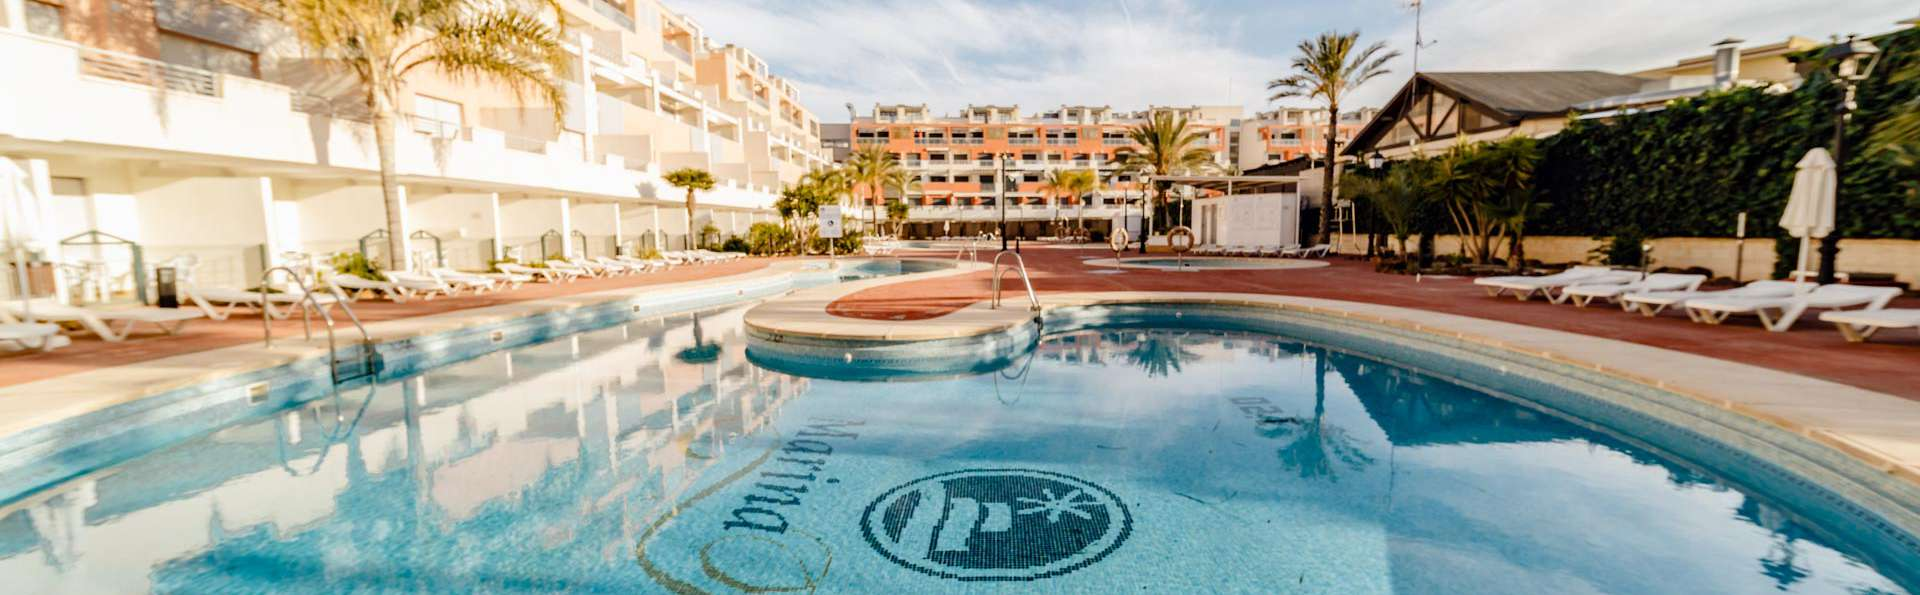 Apartamentos Marina Rey - EDIT_POOL_14.jpg